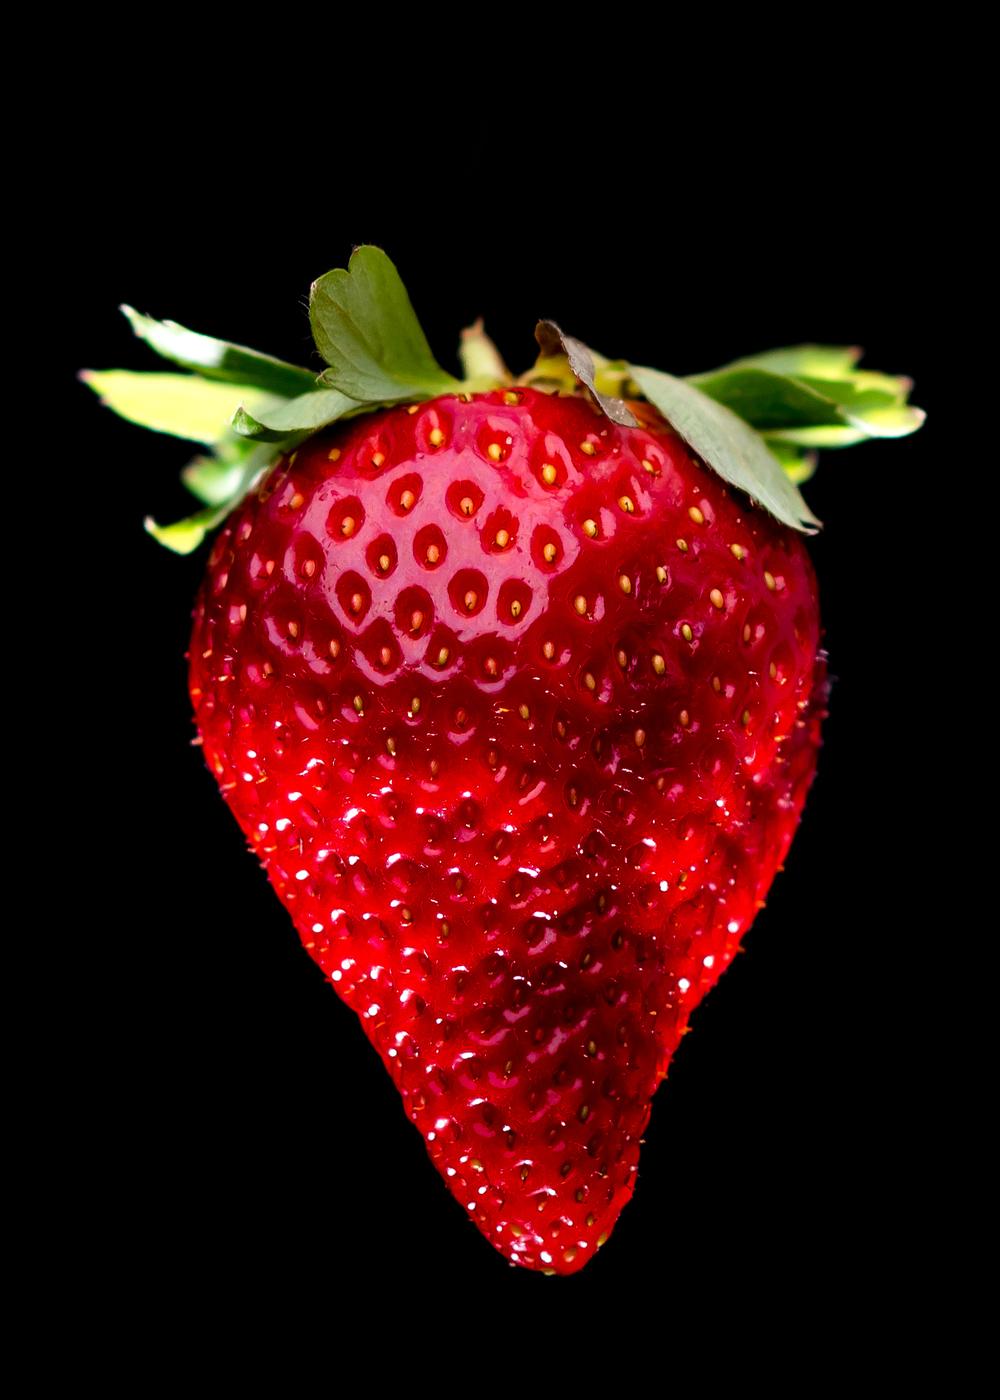 Strawberry-26.jpg